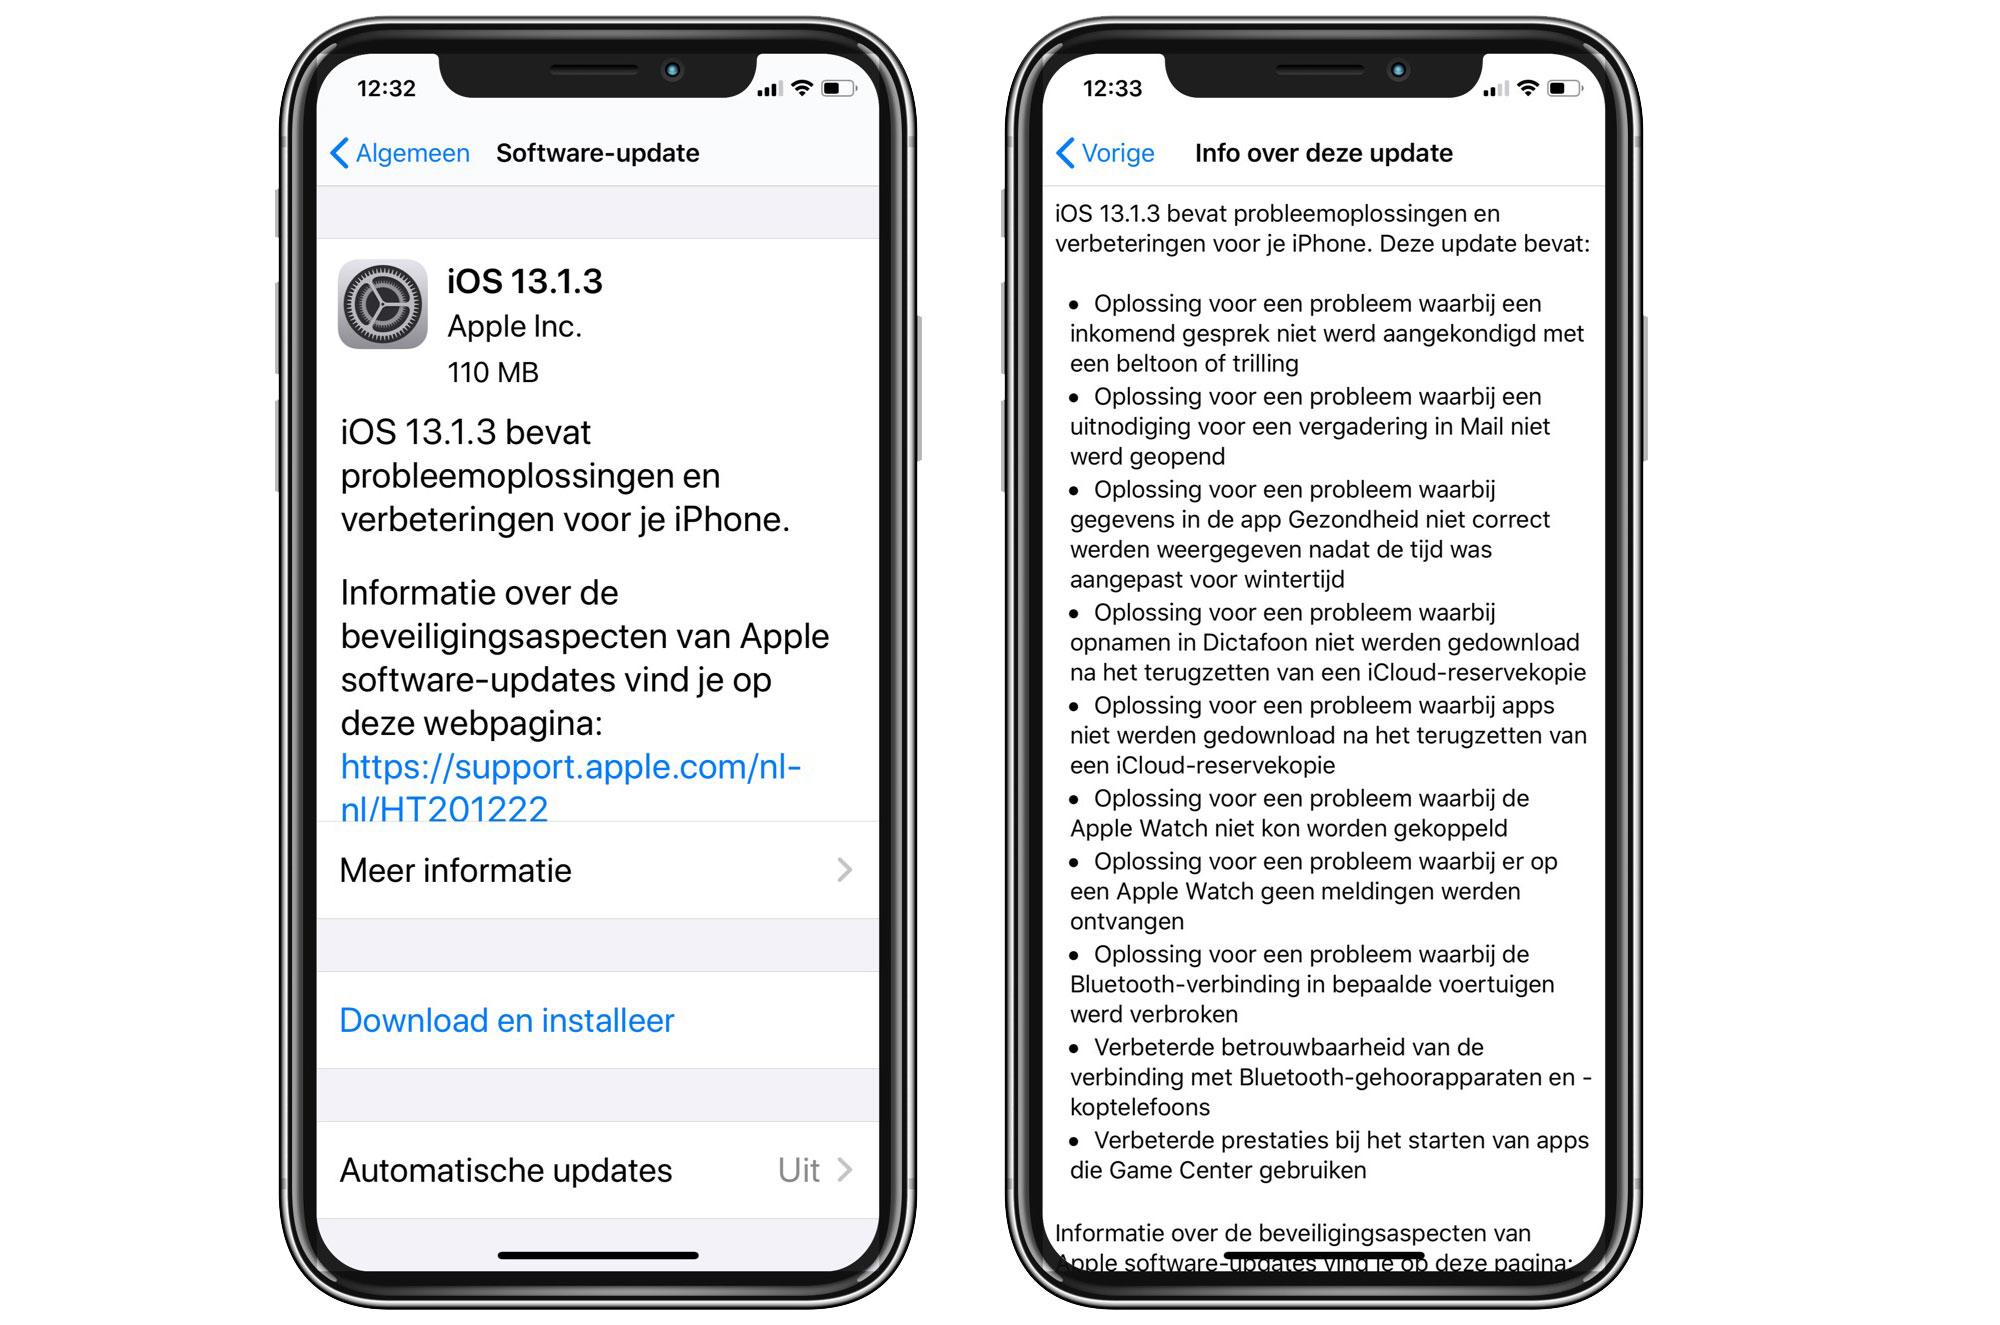 https://www.macfreak.nl/modules/news/images/zArt.iOS13.1.3ReleaseNotes.jpg